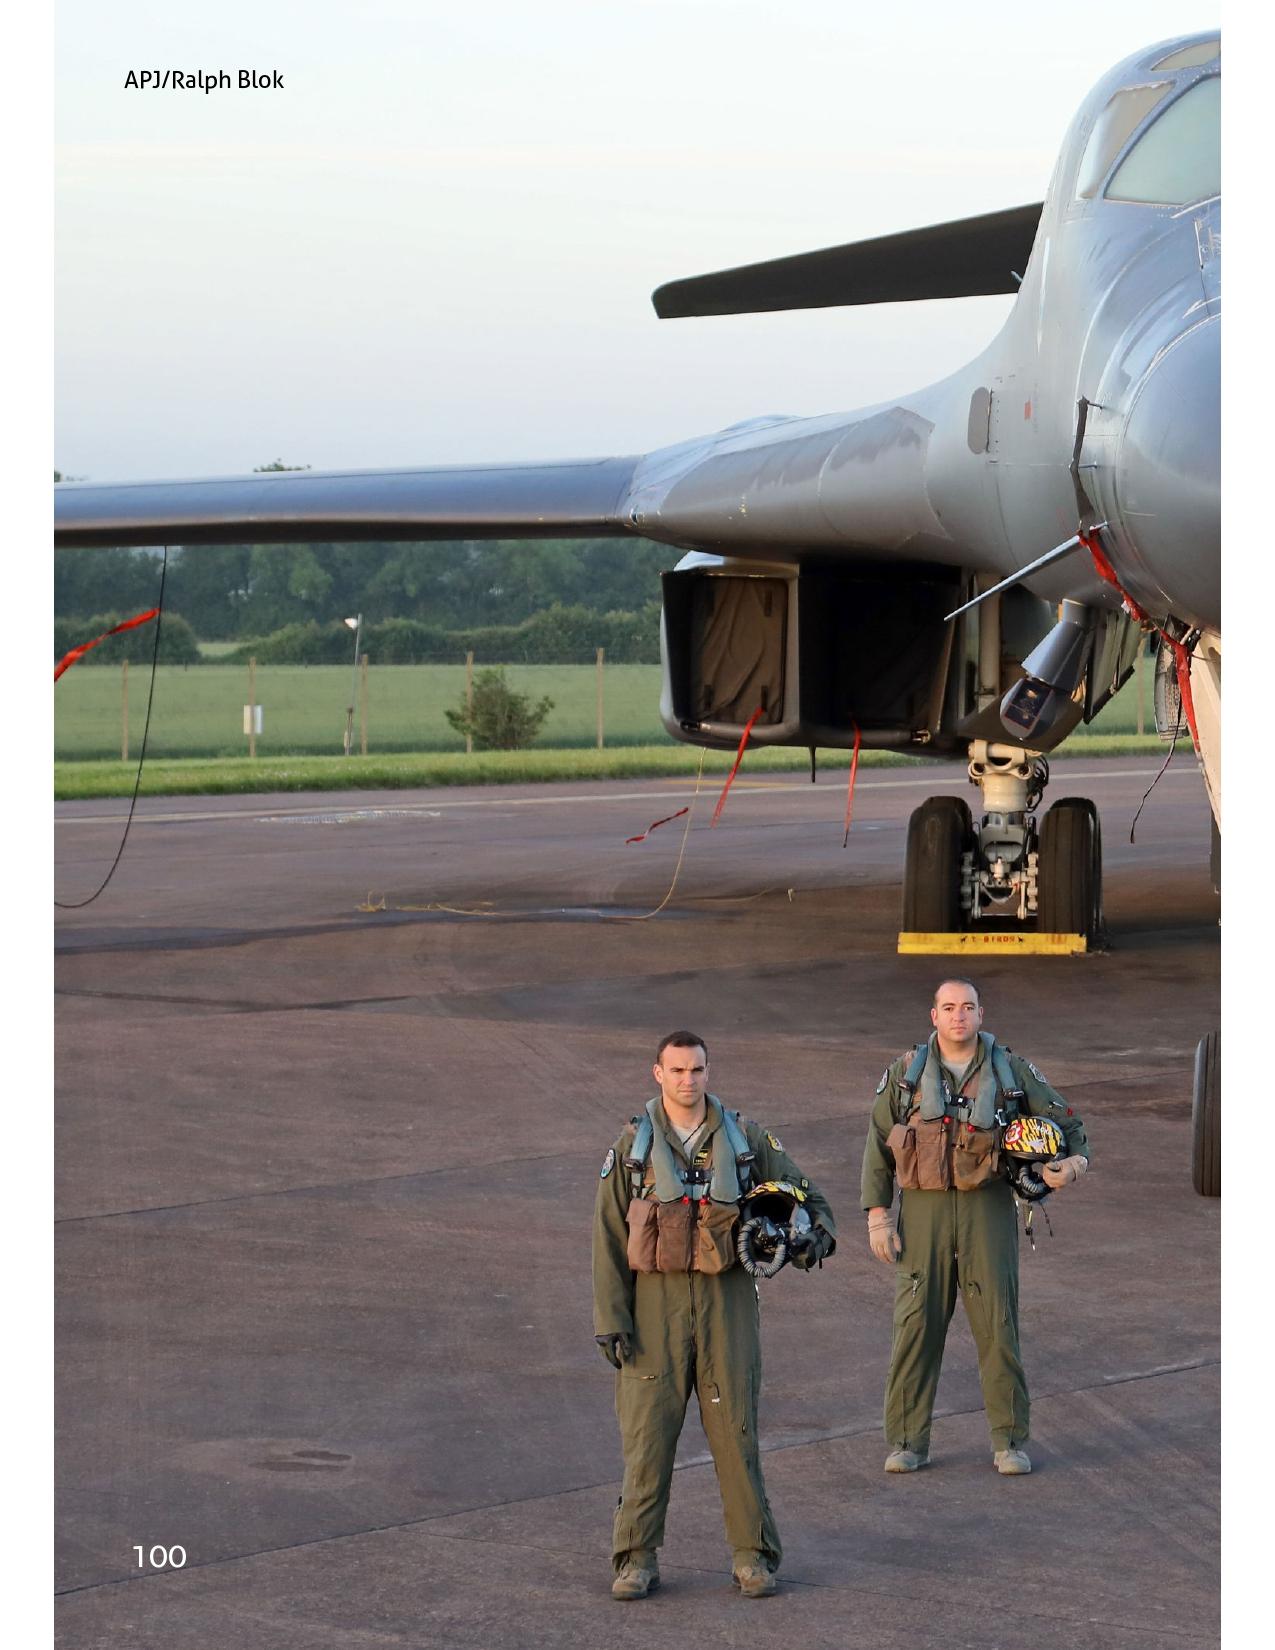 Aviation+Photojournal+January+-+April+2018-3_page-0100